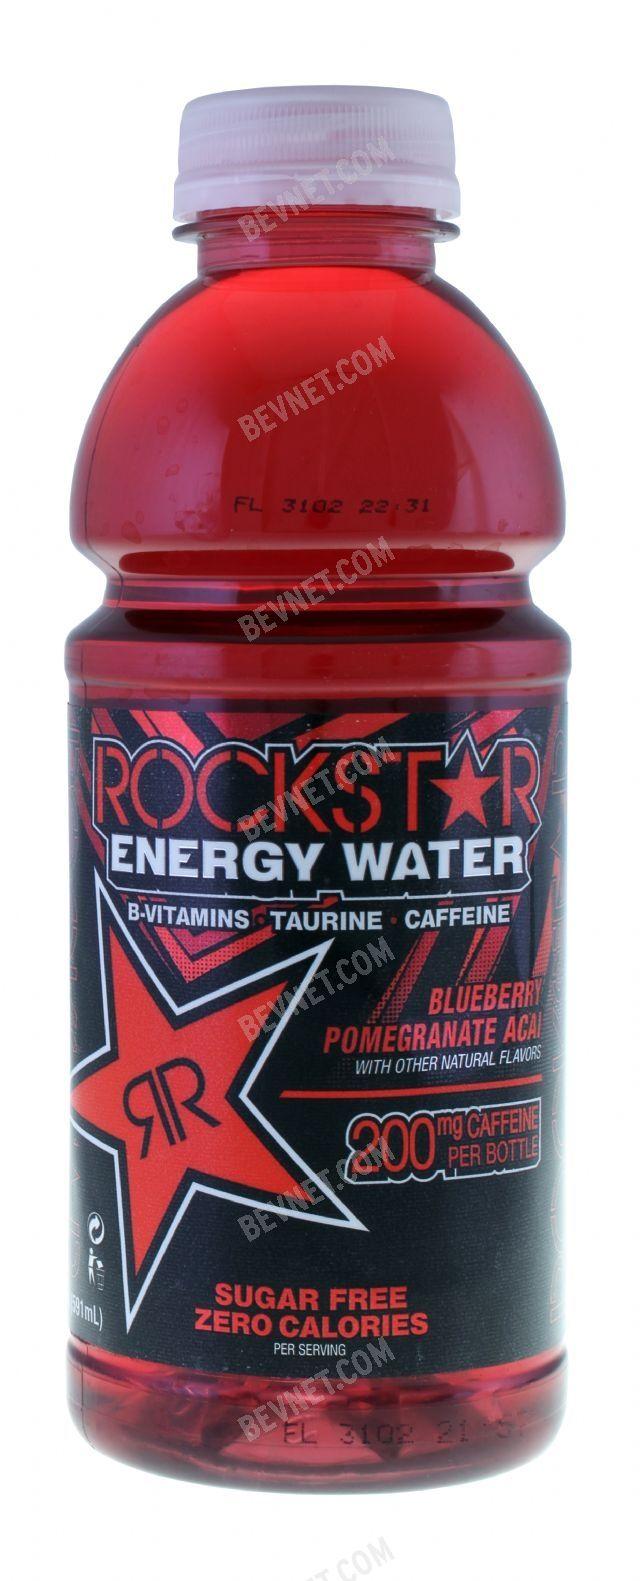 Rockstar Energy Water: